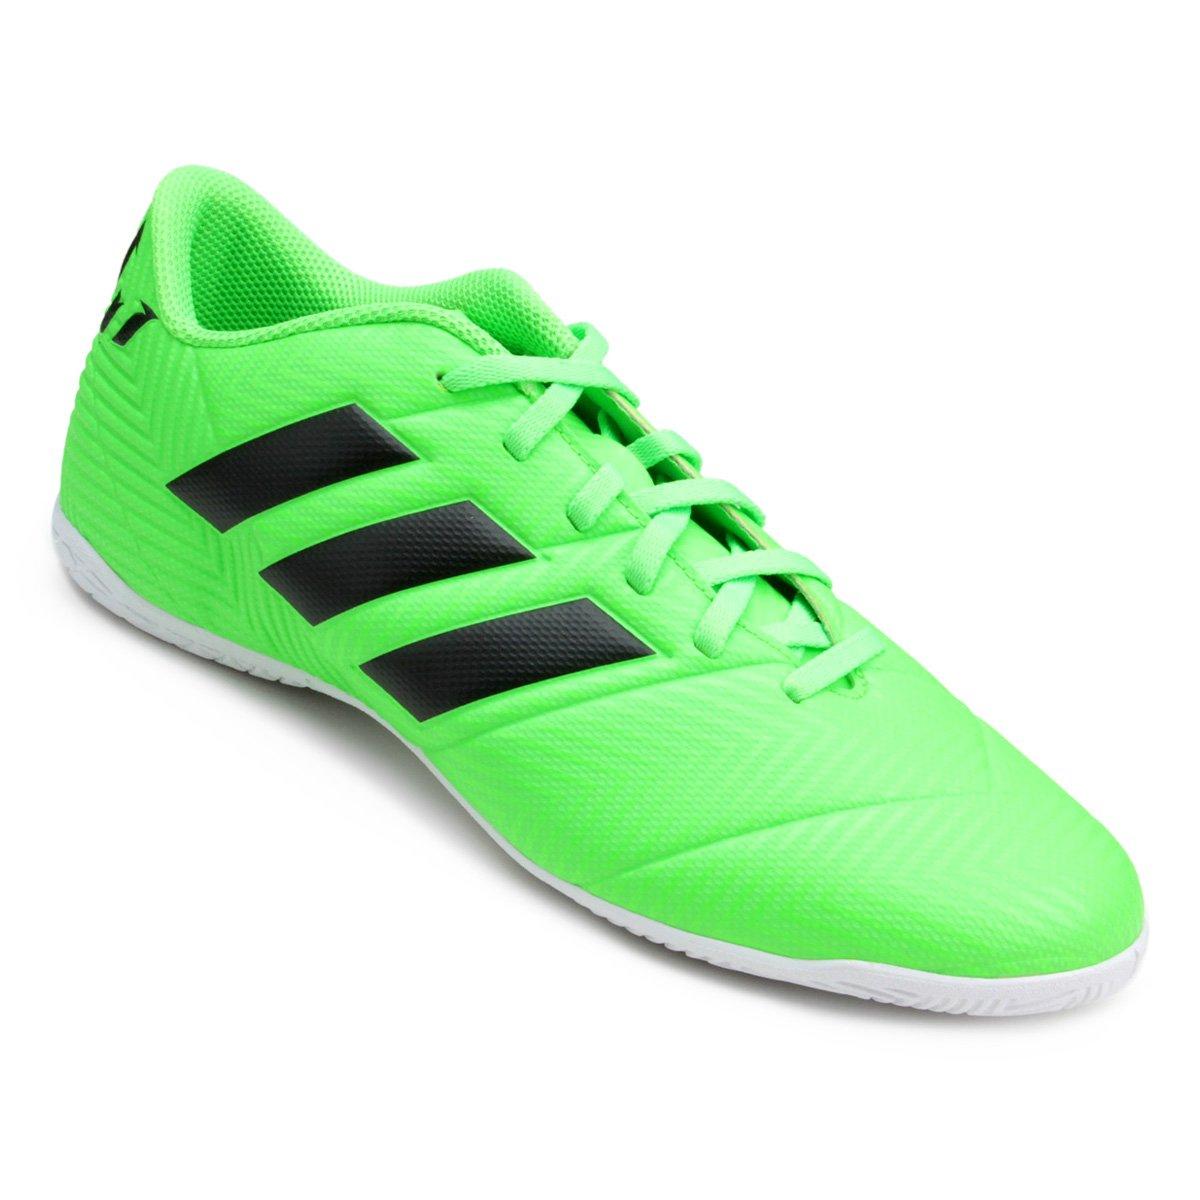 acab5253cec60 Chuteira Futsal Adidas Nemeziz Messi Tan 18 4 IN - Verde e Preto | Allianz  Parque Shop